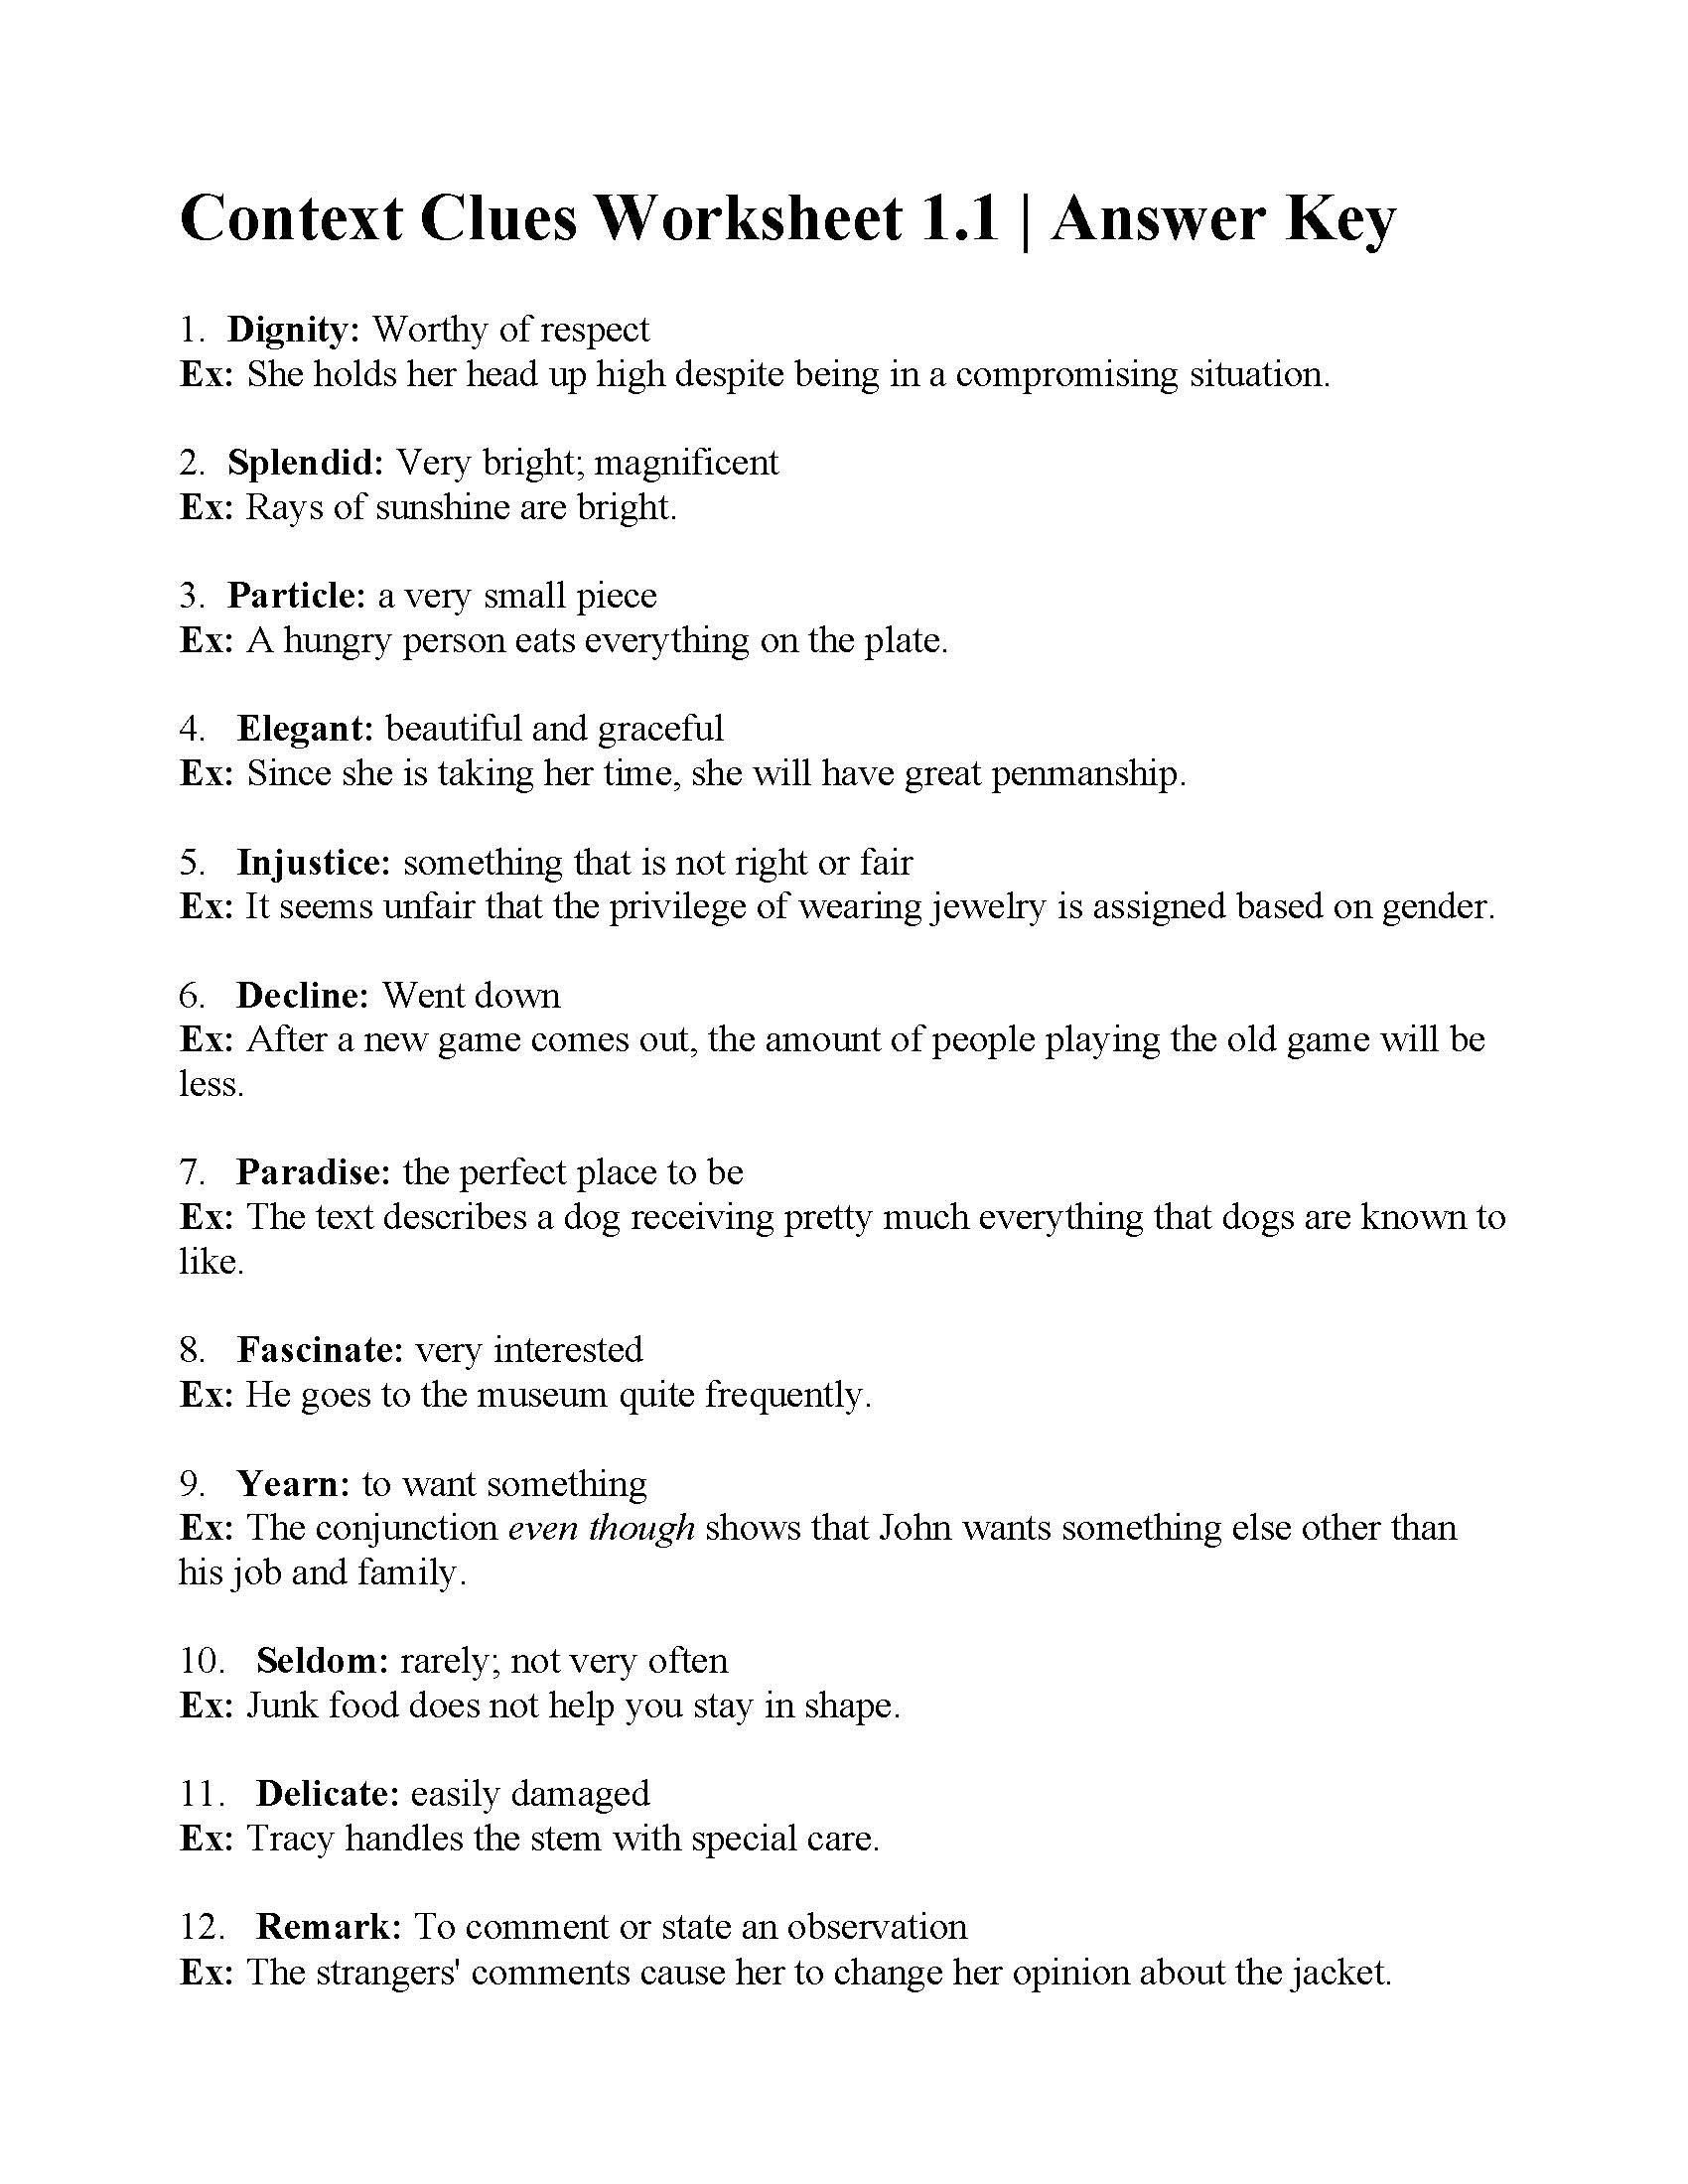 2nd Grade Context Clues Worksheets 38 Interesting Context Clues Worksheets In 2020 Context Clues Worksheets Context Clues Context Clues Lesson